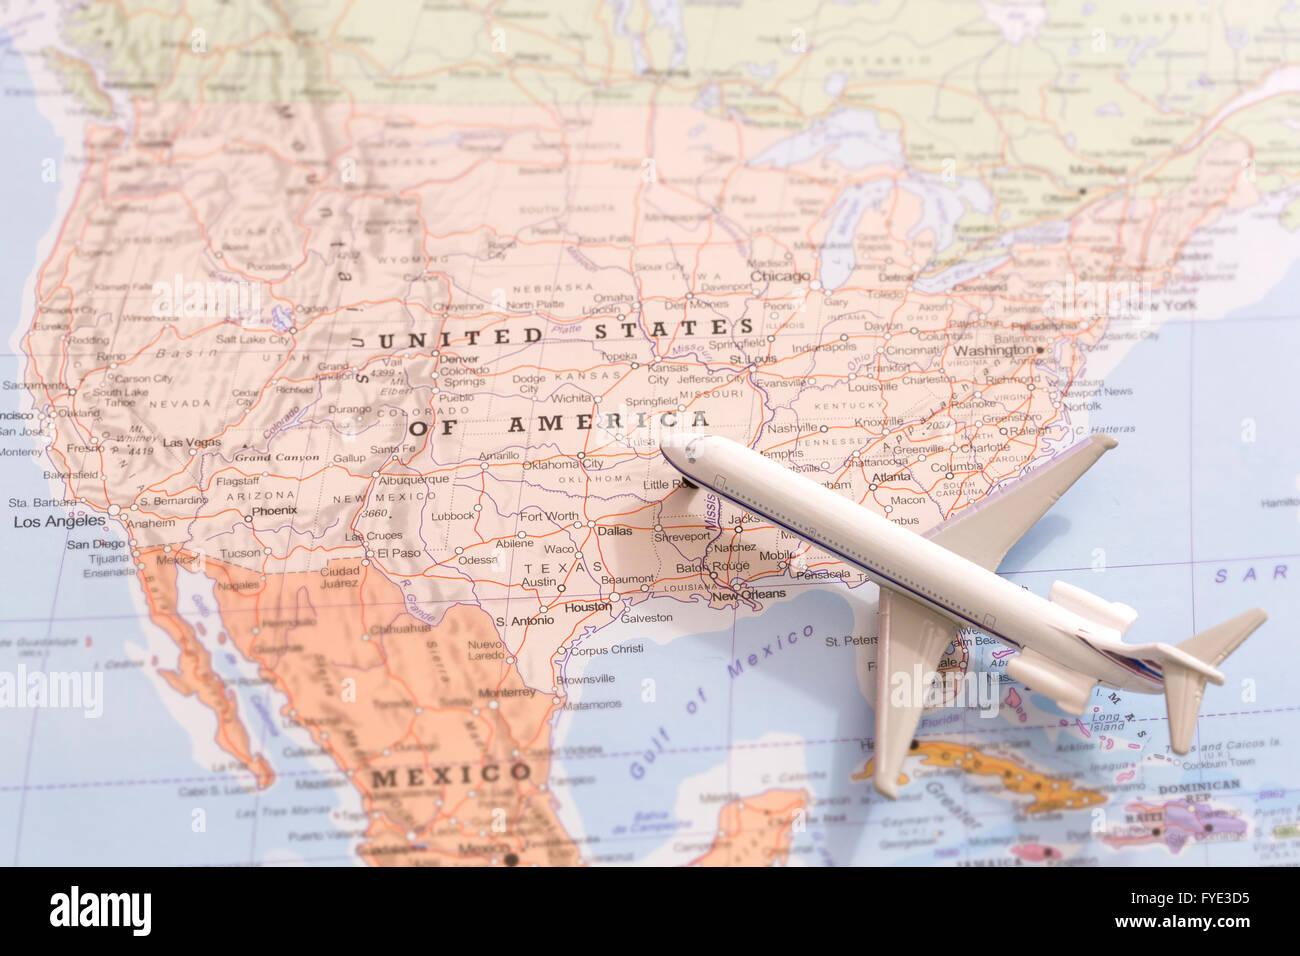 Travel United America Passenger Plane Stock Photos  Travel United - United states of america map los angeles